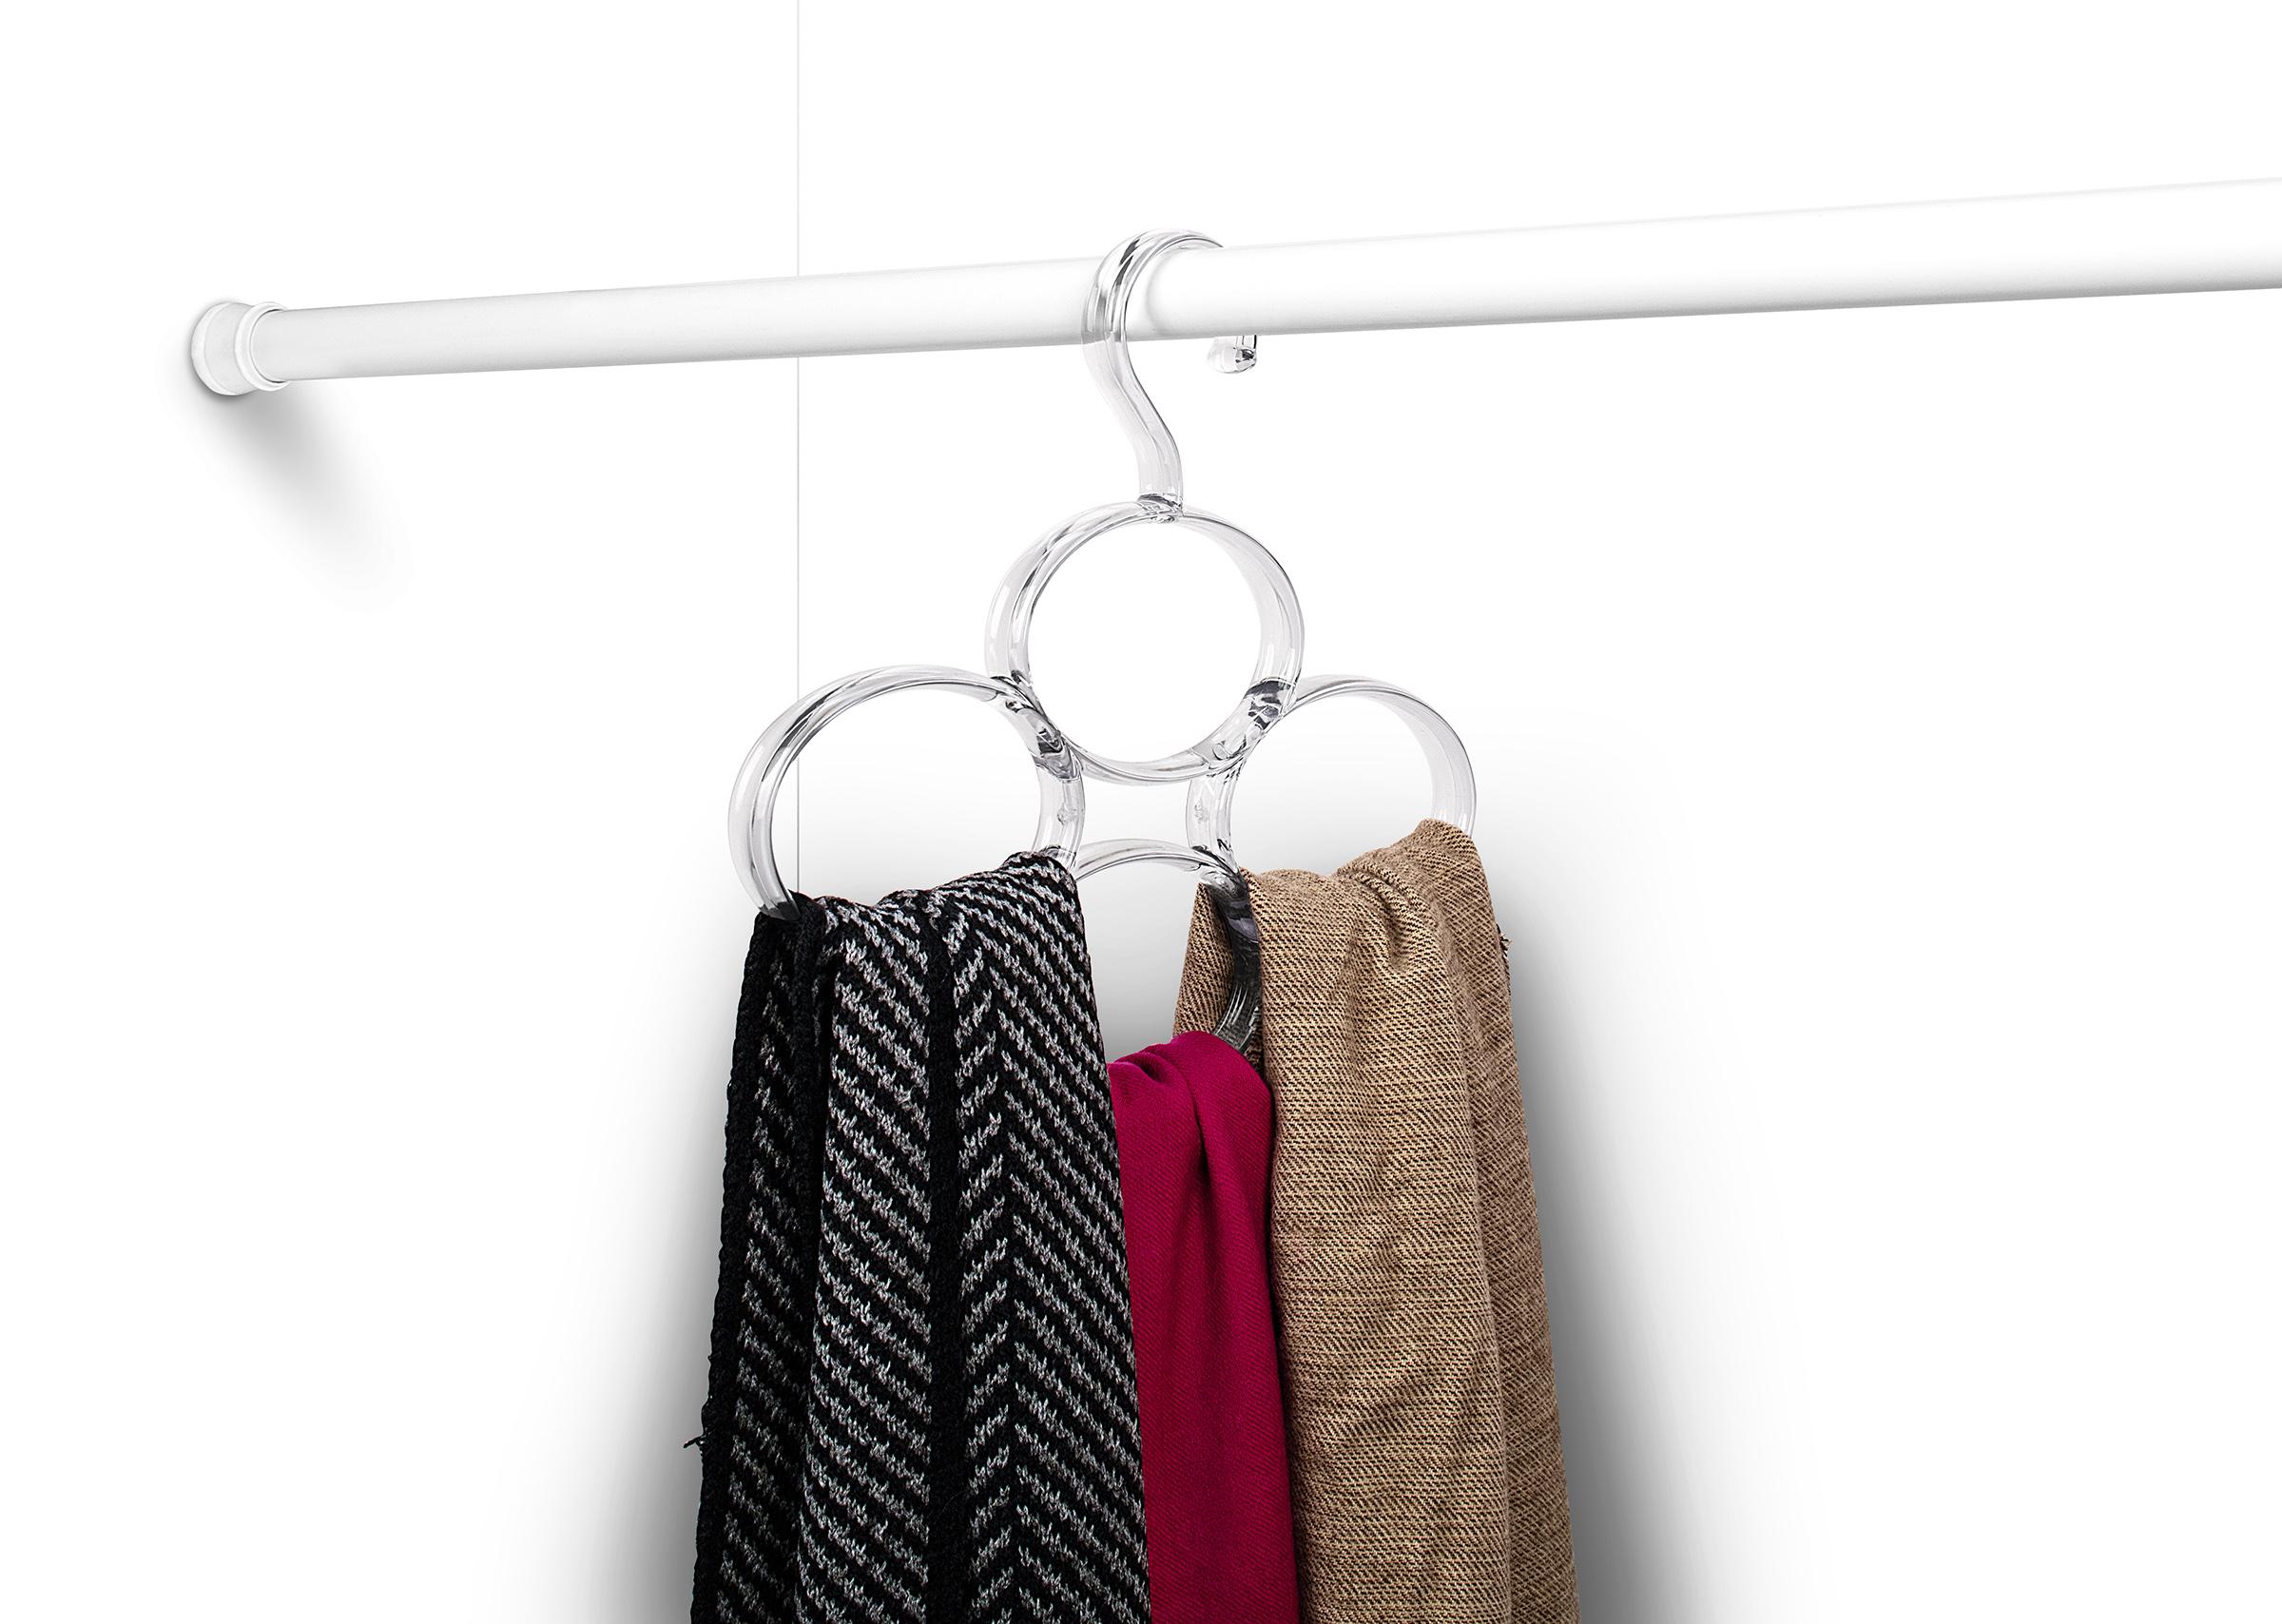 closet organization multi scarf hanger